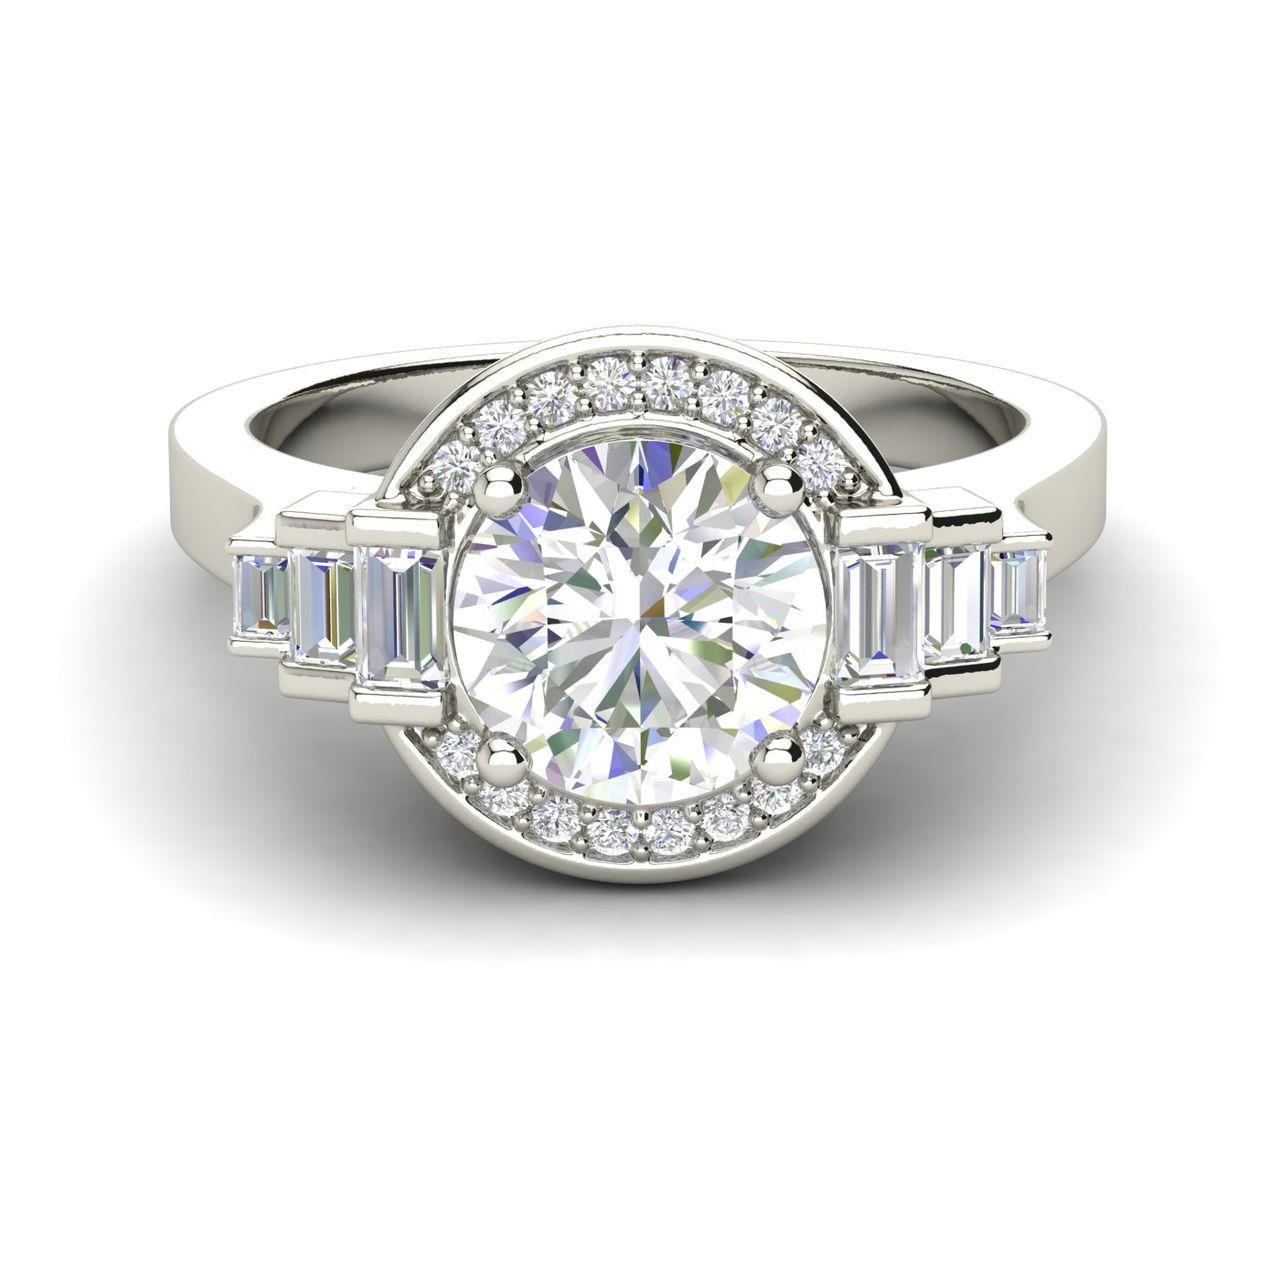 Halo Solitaire 0.8 Carat Round Cut Diamond Engagement Ring